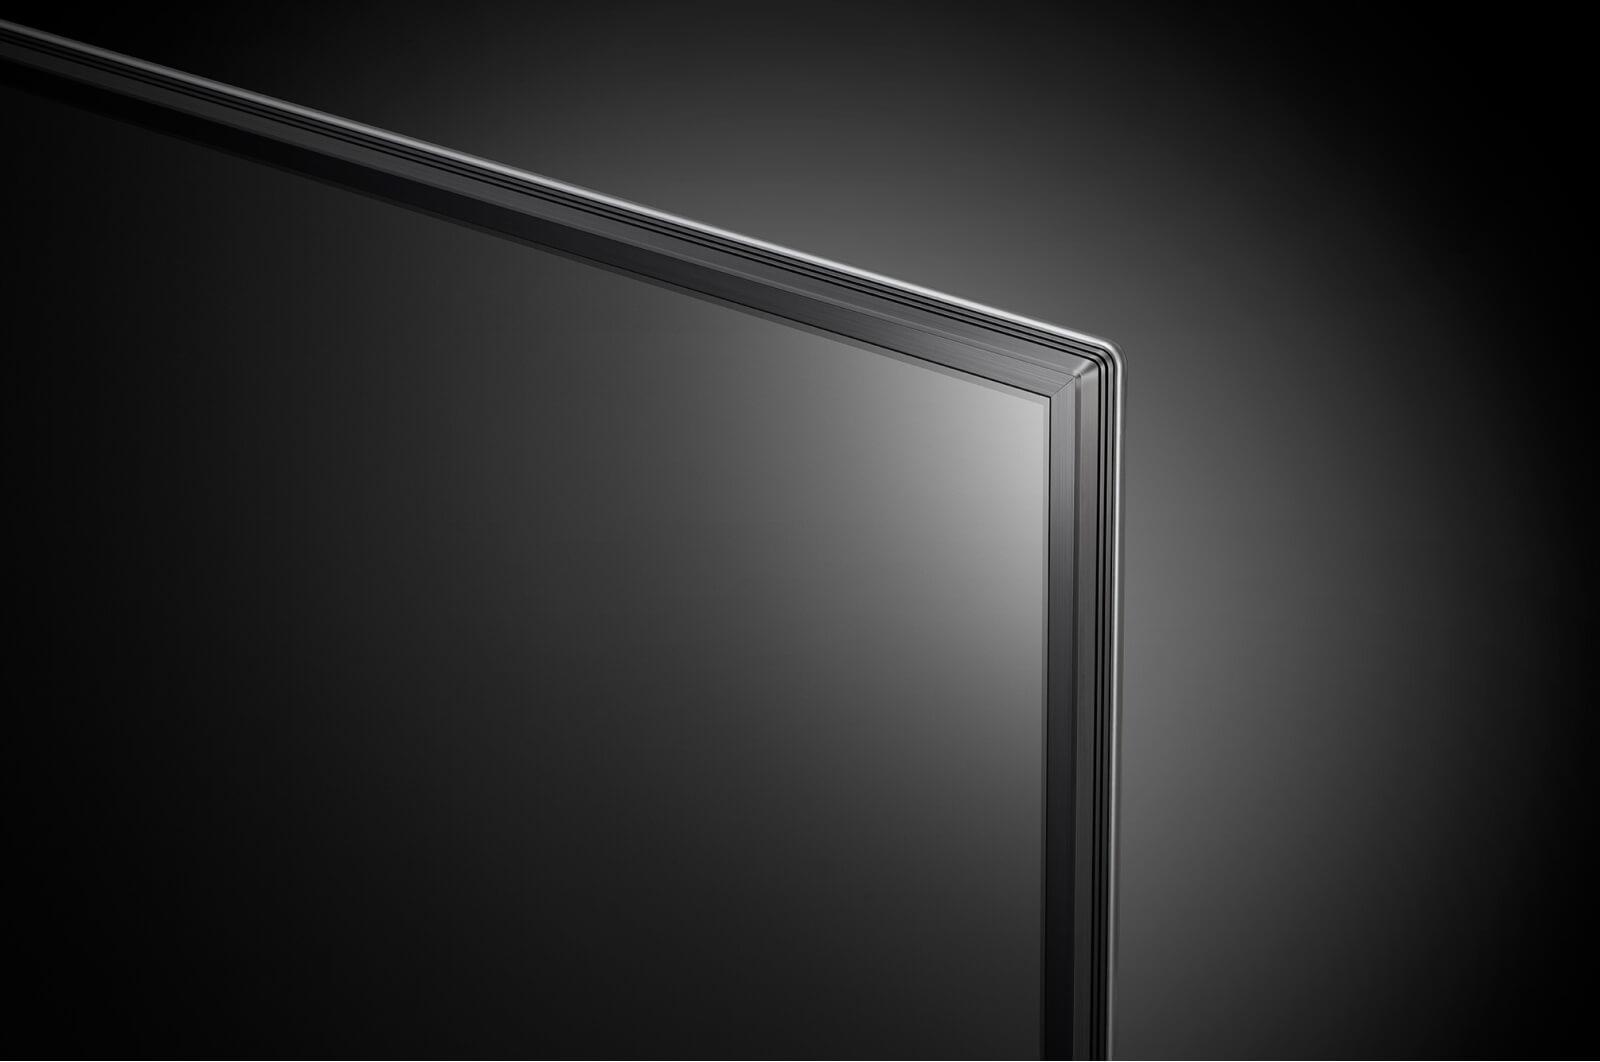 LG SK8000 Super UHD 4K HDR Premium Smart LED TV with Freeview Play - Brilliant Titan Bezel